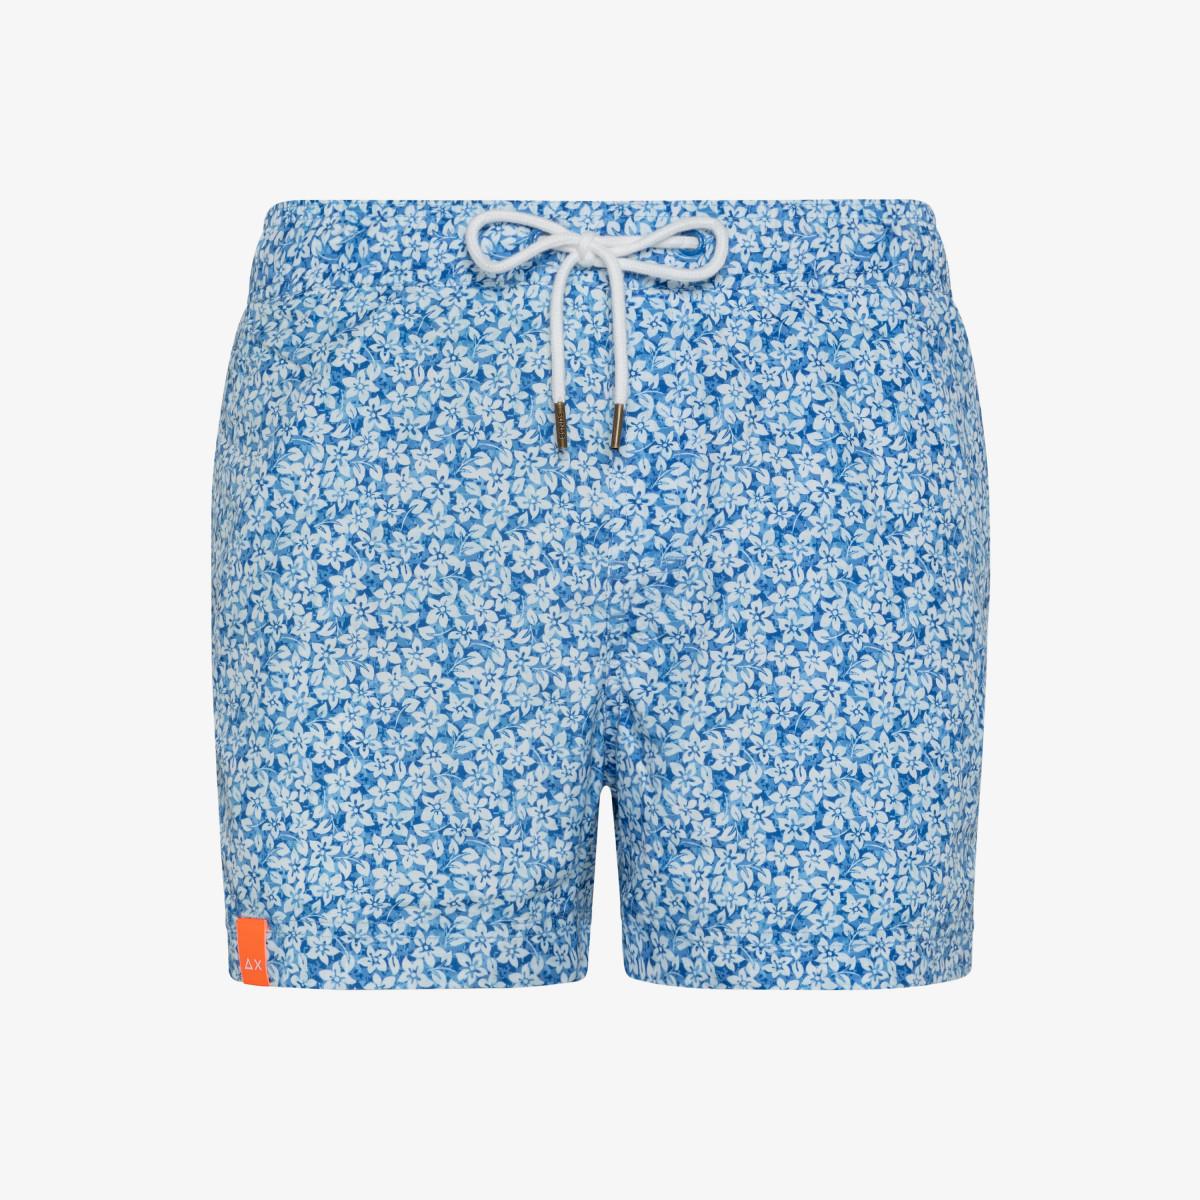 SWIM PANT MICRO PRINT BLUE/WHITE